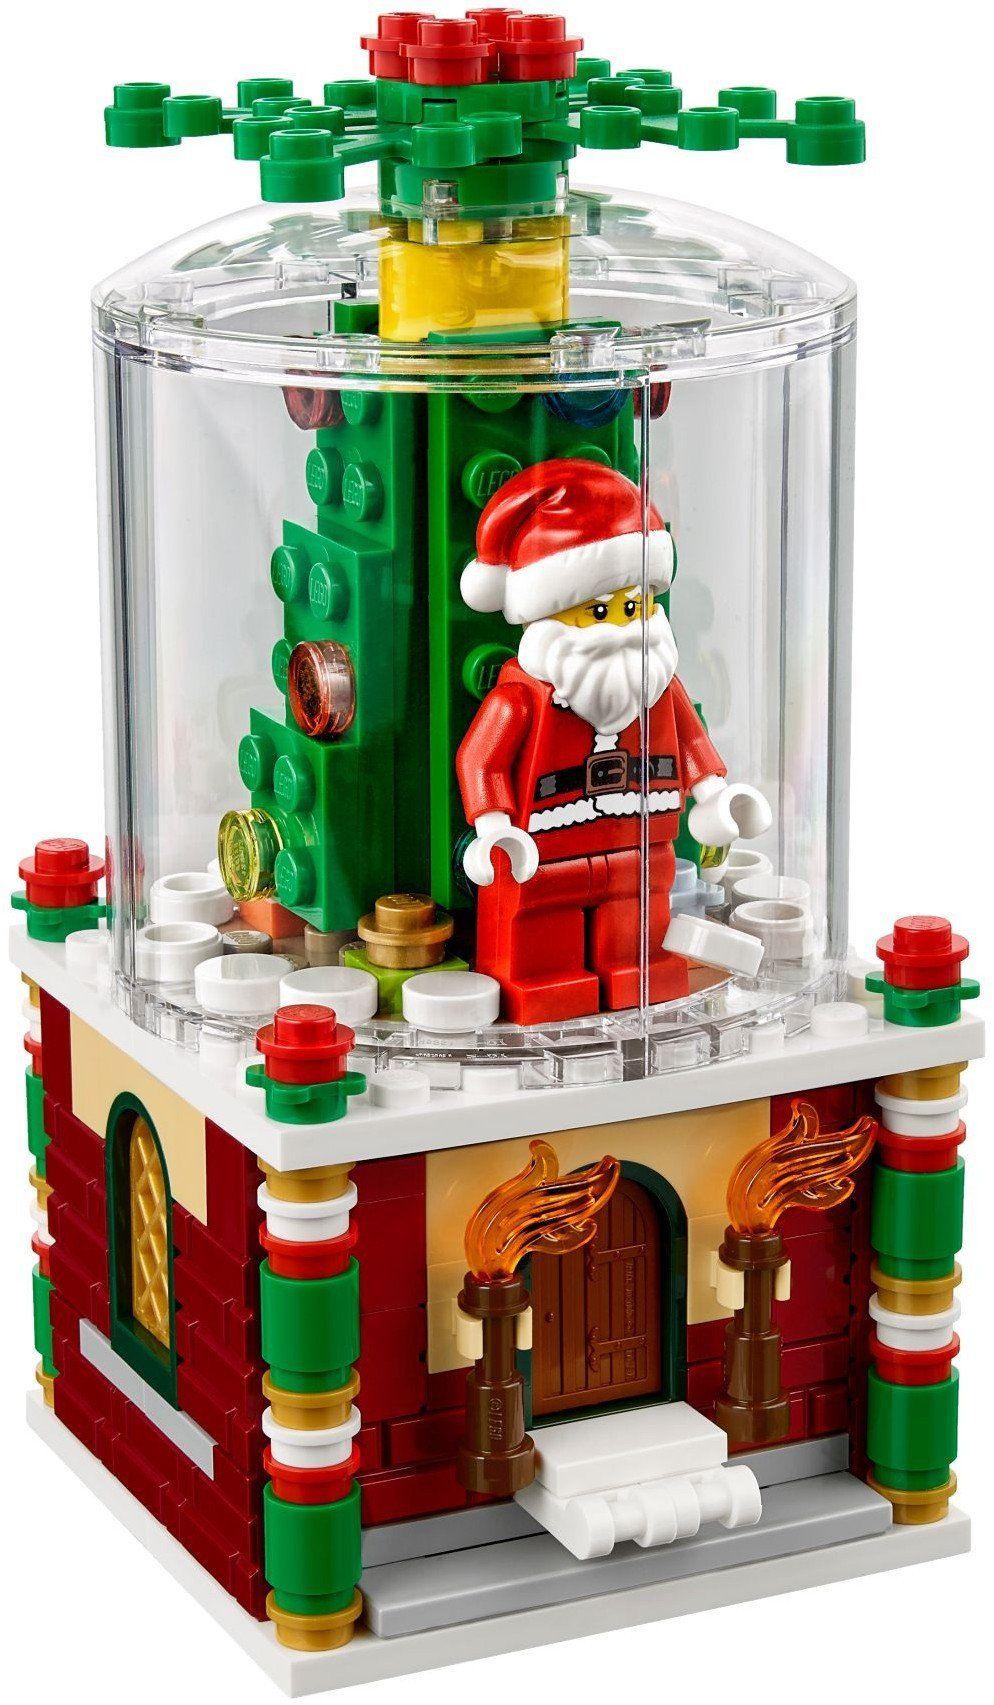 Lego 40223 Exclusive Limited Edition Snowglobe Lego